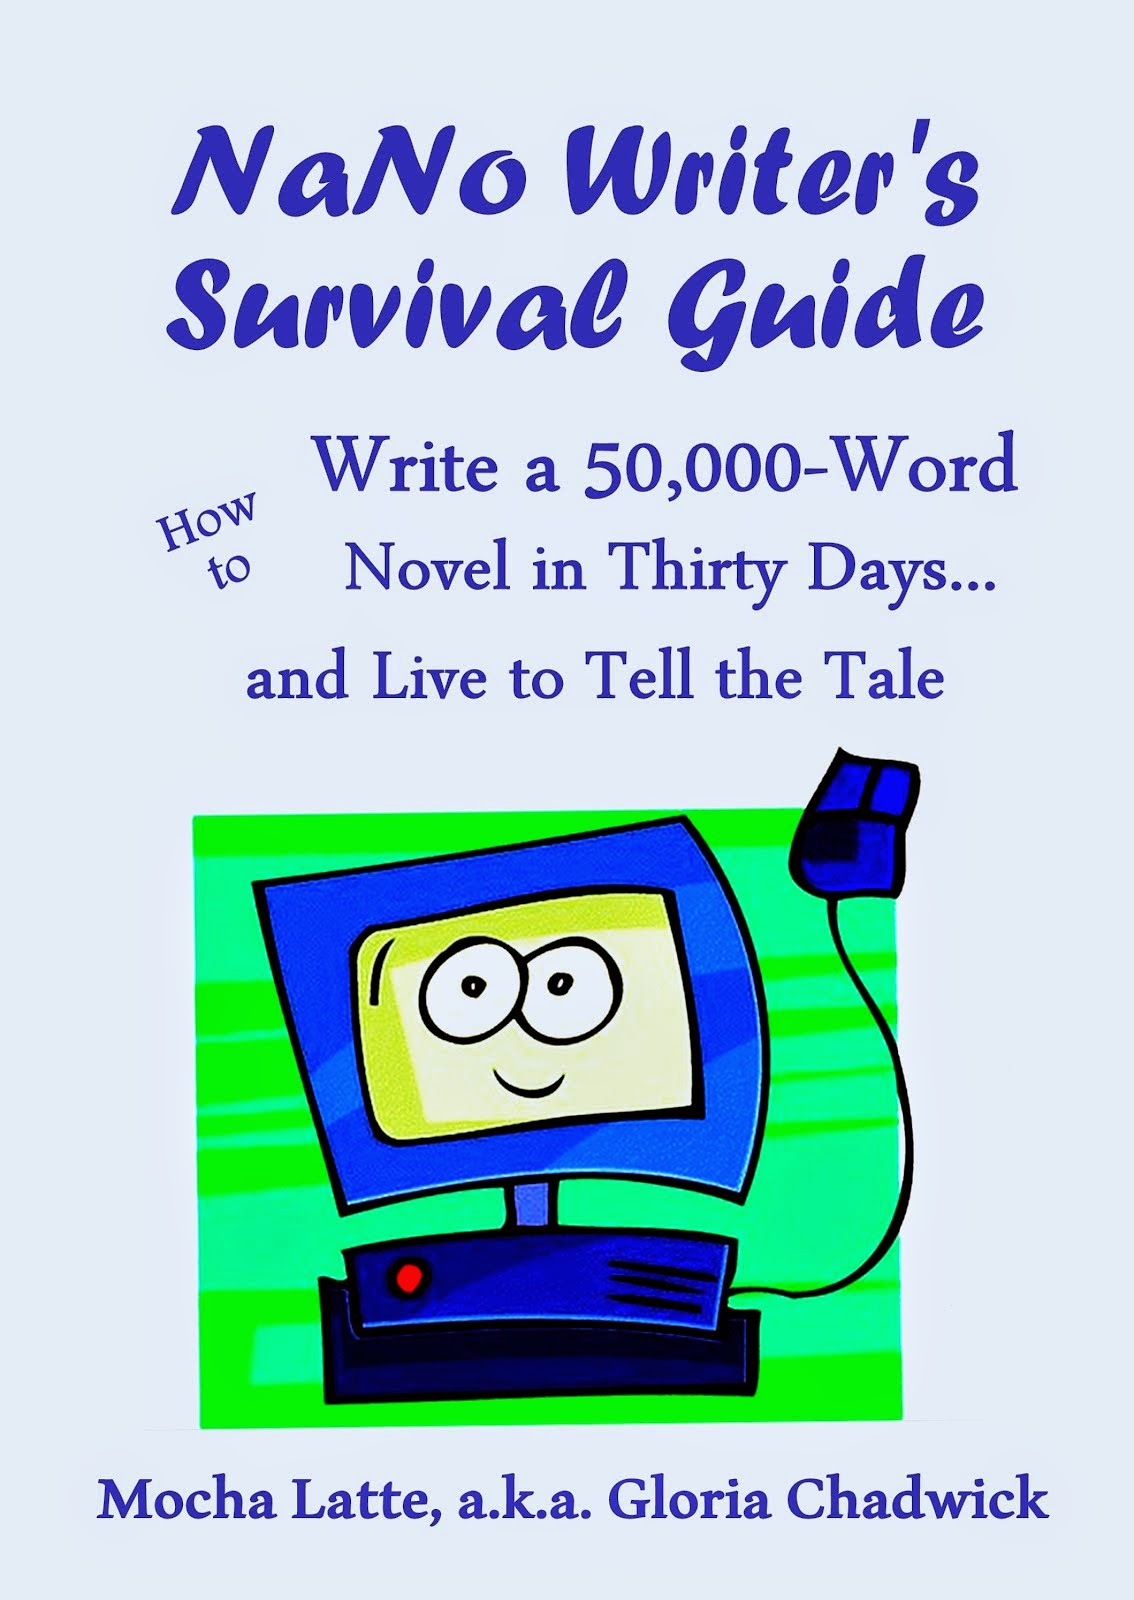 NaNo Writer's Guide